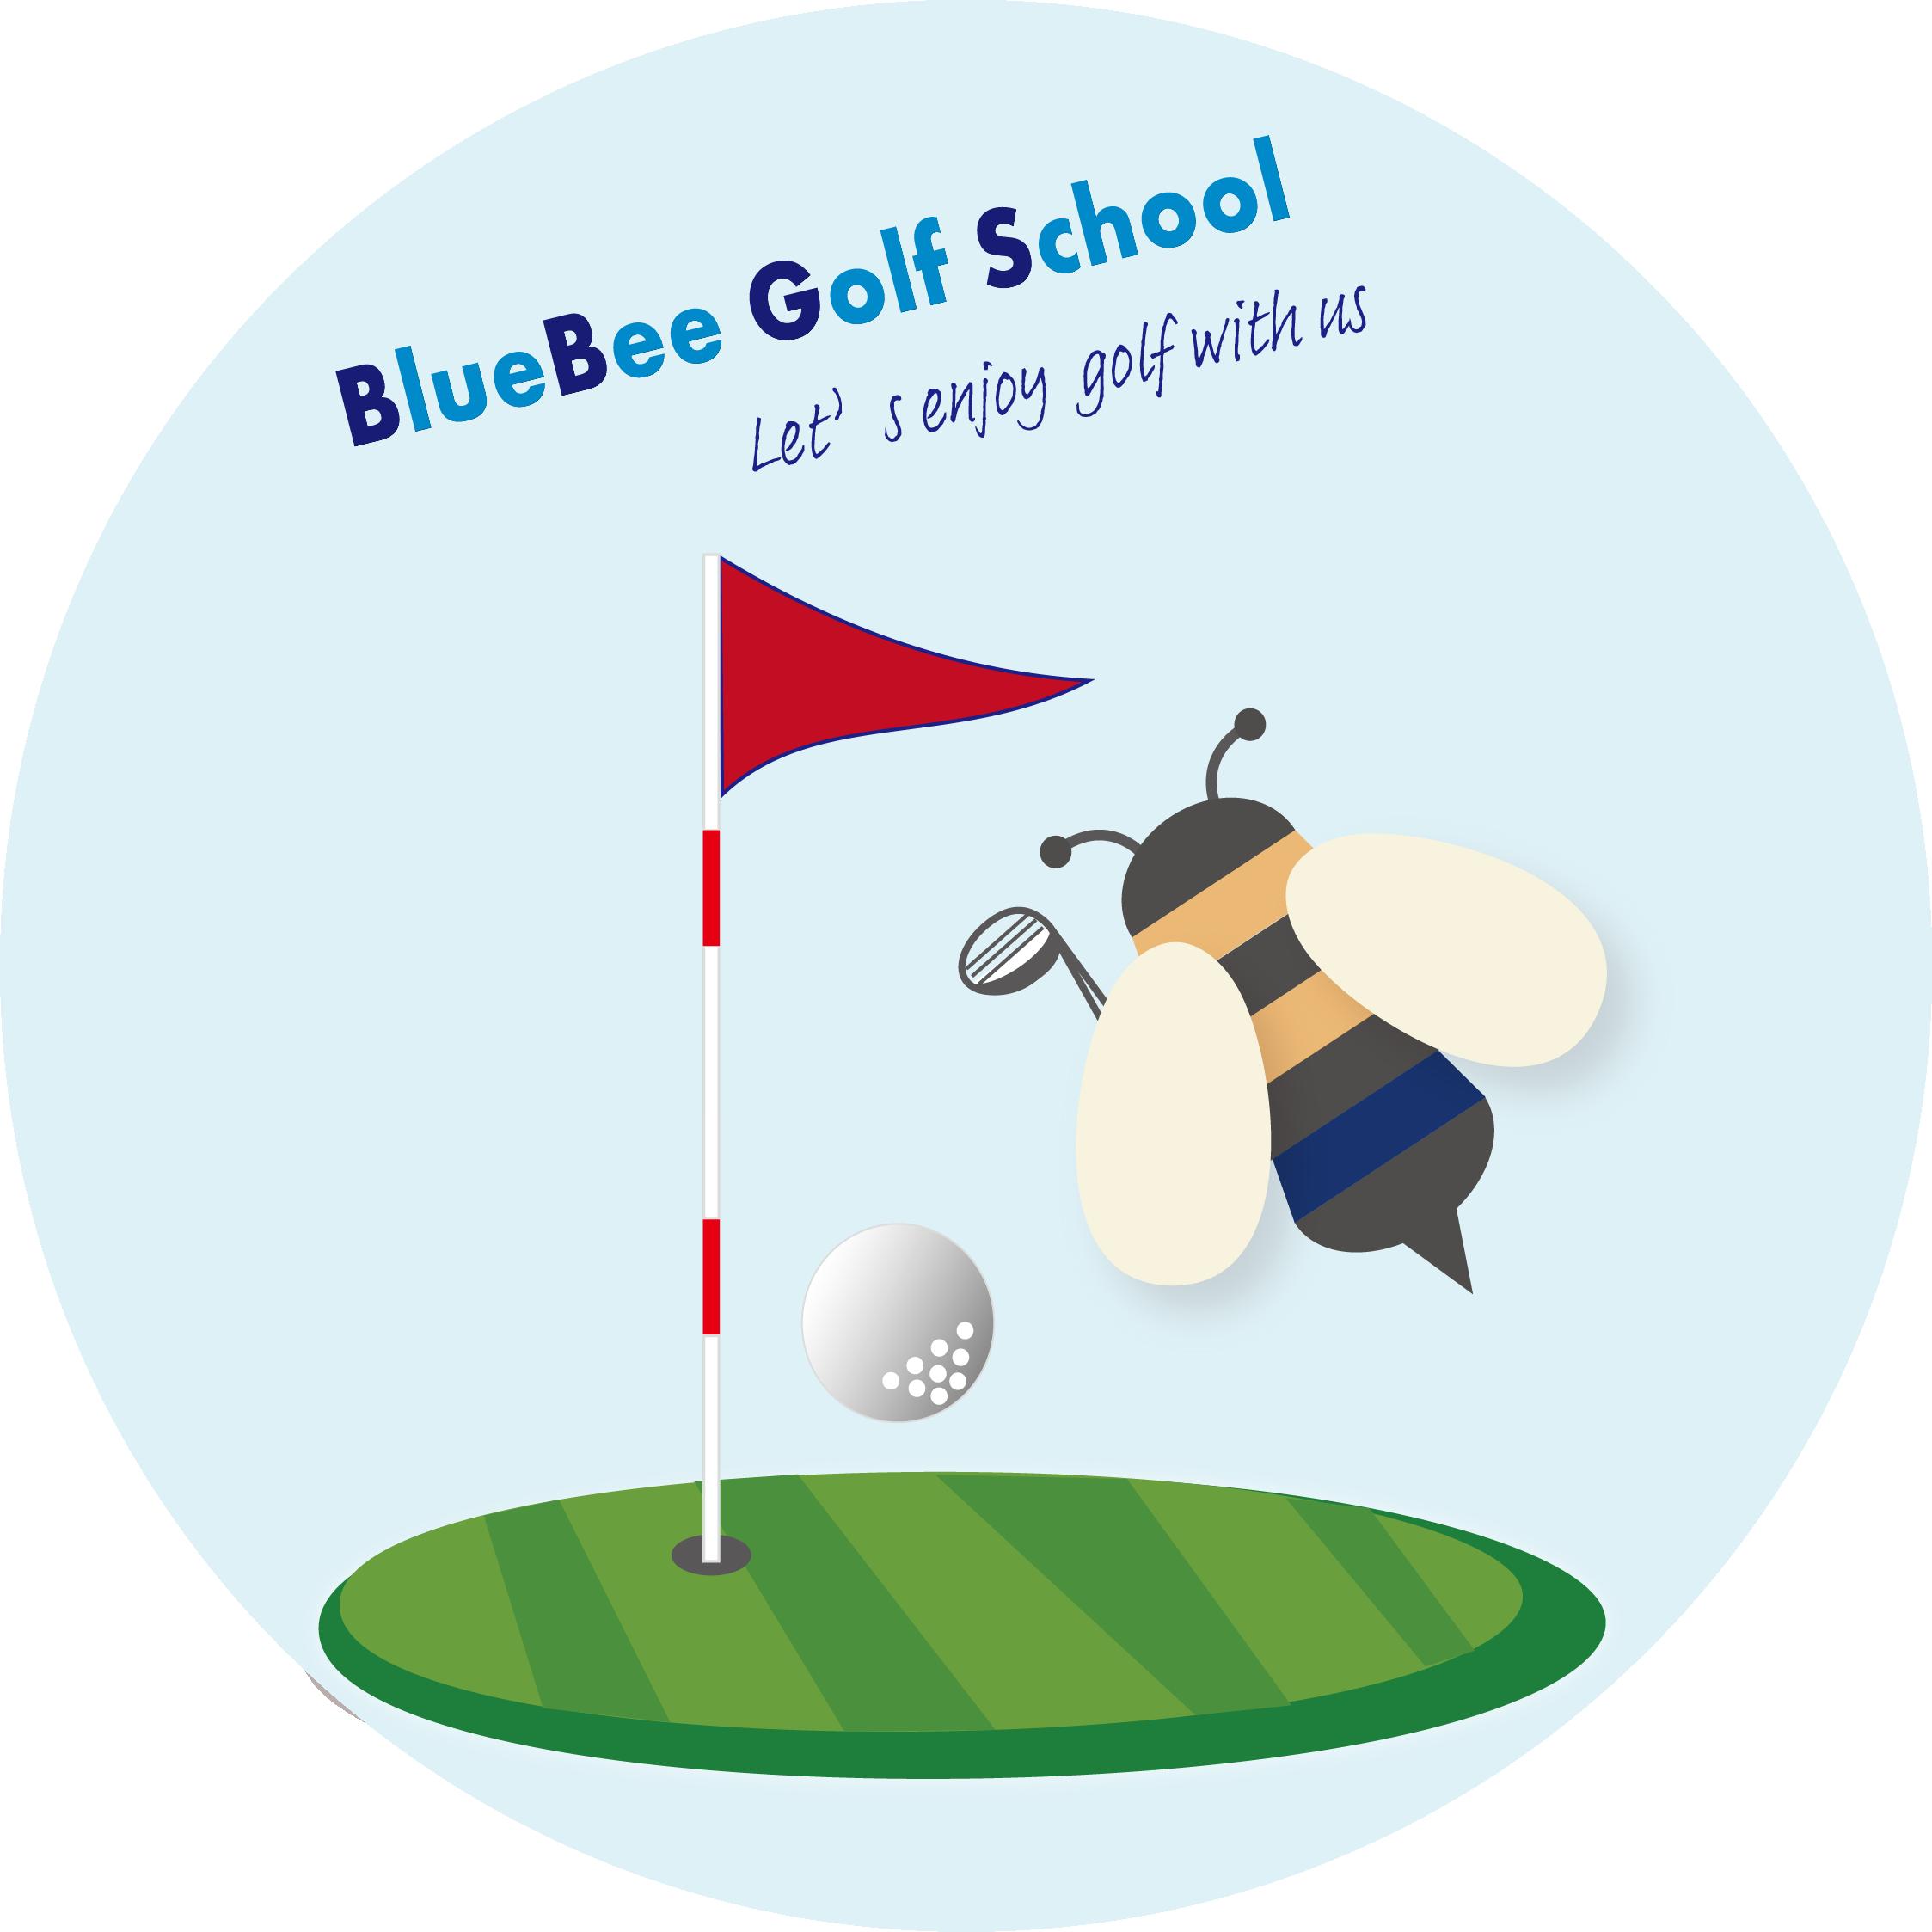 BlueBee Golf School